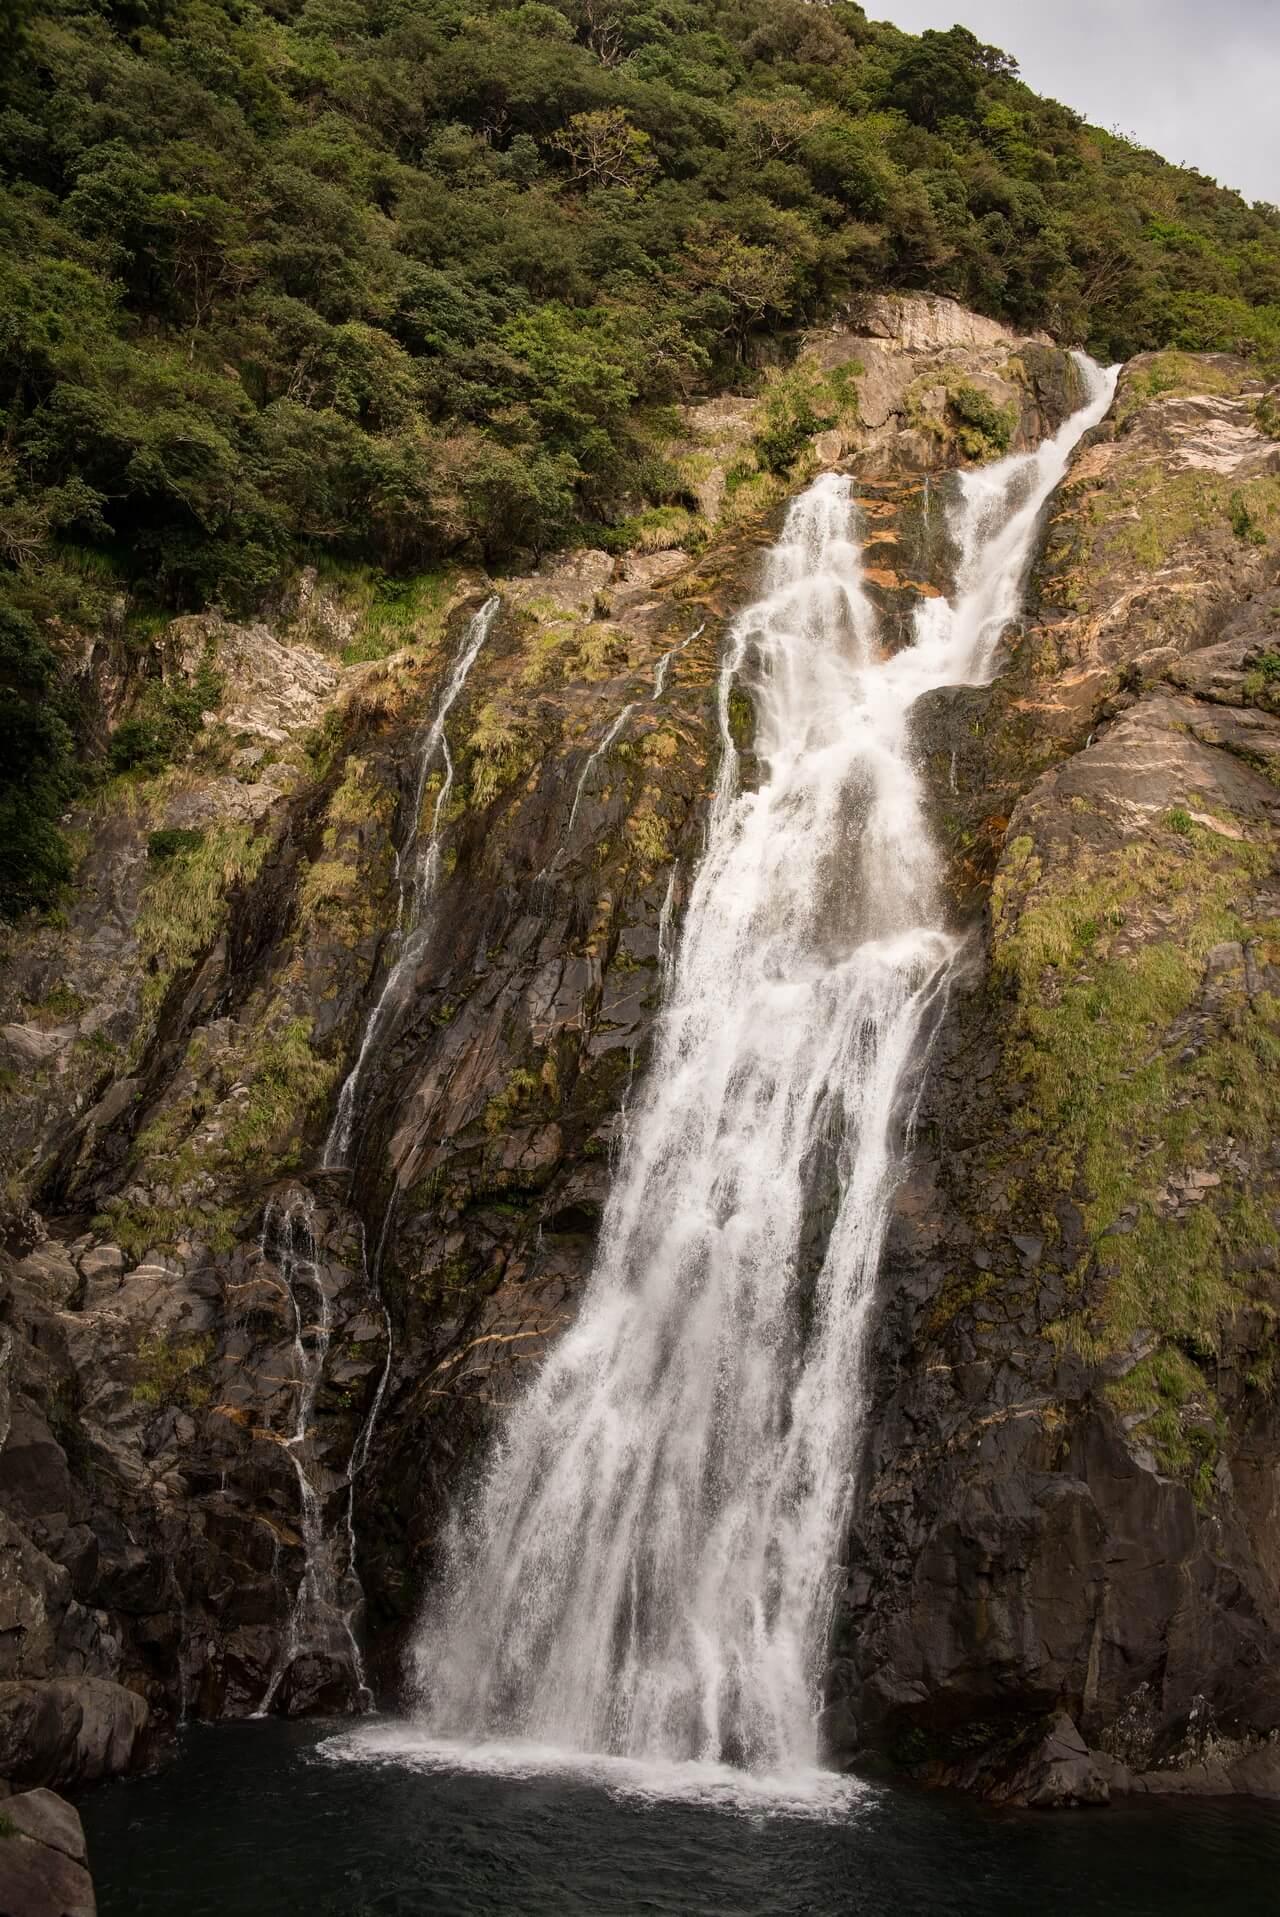 Japan: Yakushima Island waterfall Oko-no-taki, Fotograf: Steffen Lohse